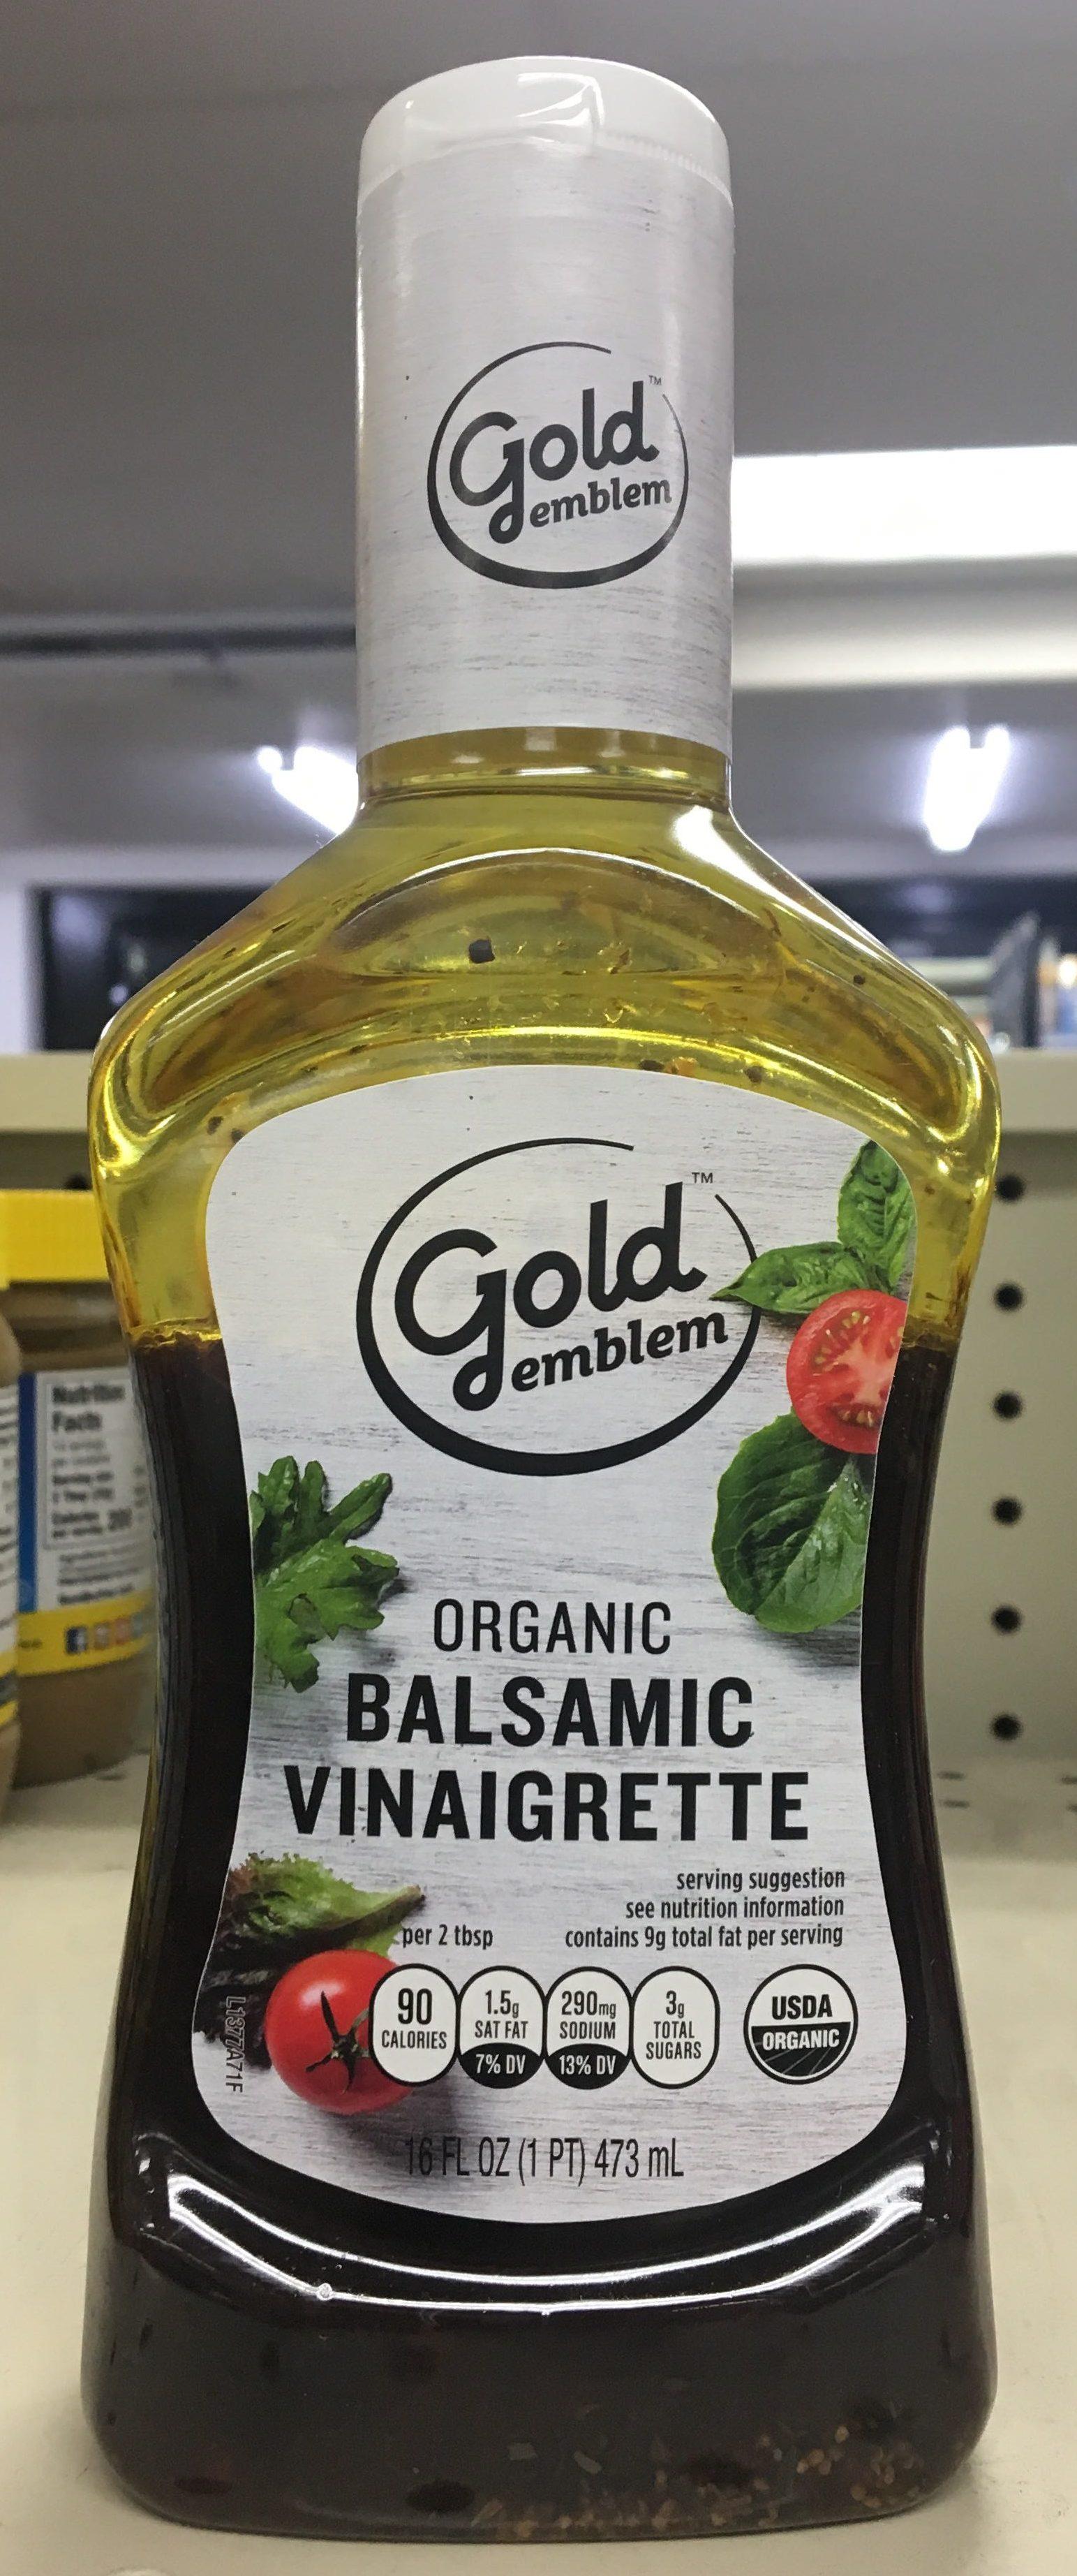 Organic Balsamic Vinaigrette - Product